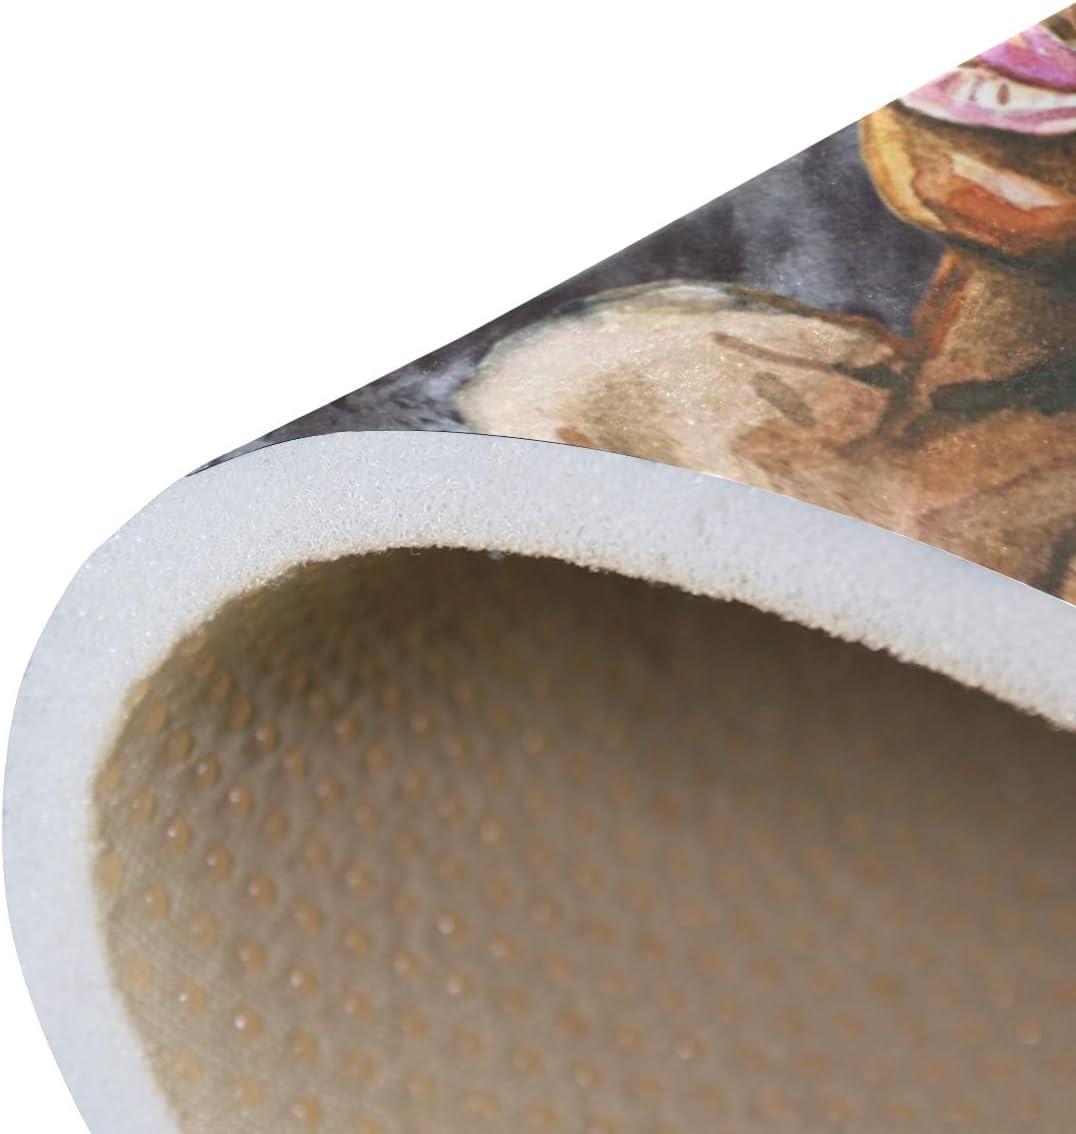 20 x 31 Inches // 50 x 80 cm Naanle Africa Non Slip Area Rug for Living Dinning Room Bedroom Kitchen Watercolor American Girls Nursery Rug Floor Carpet Yoga Mat 1.7  x 2.6